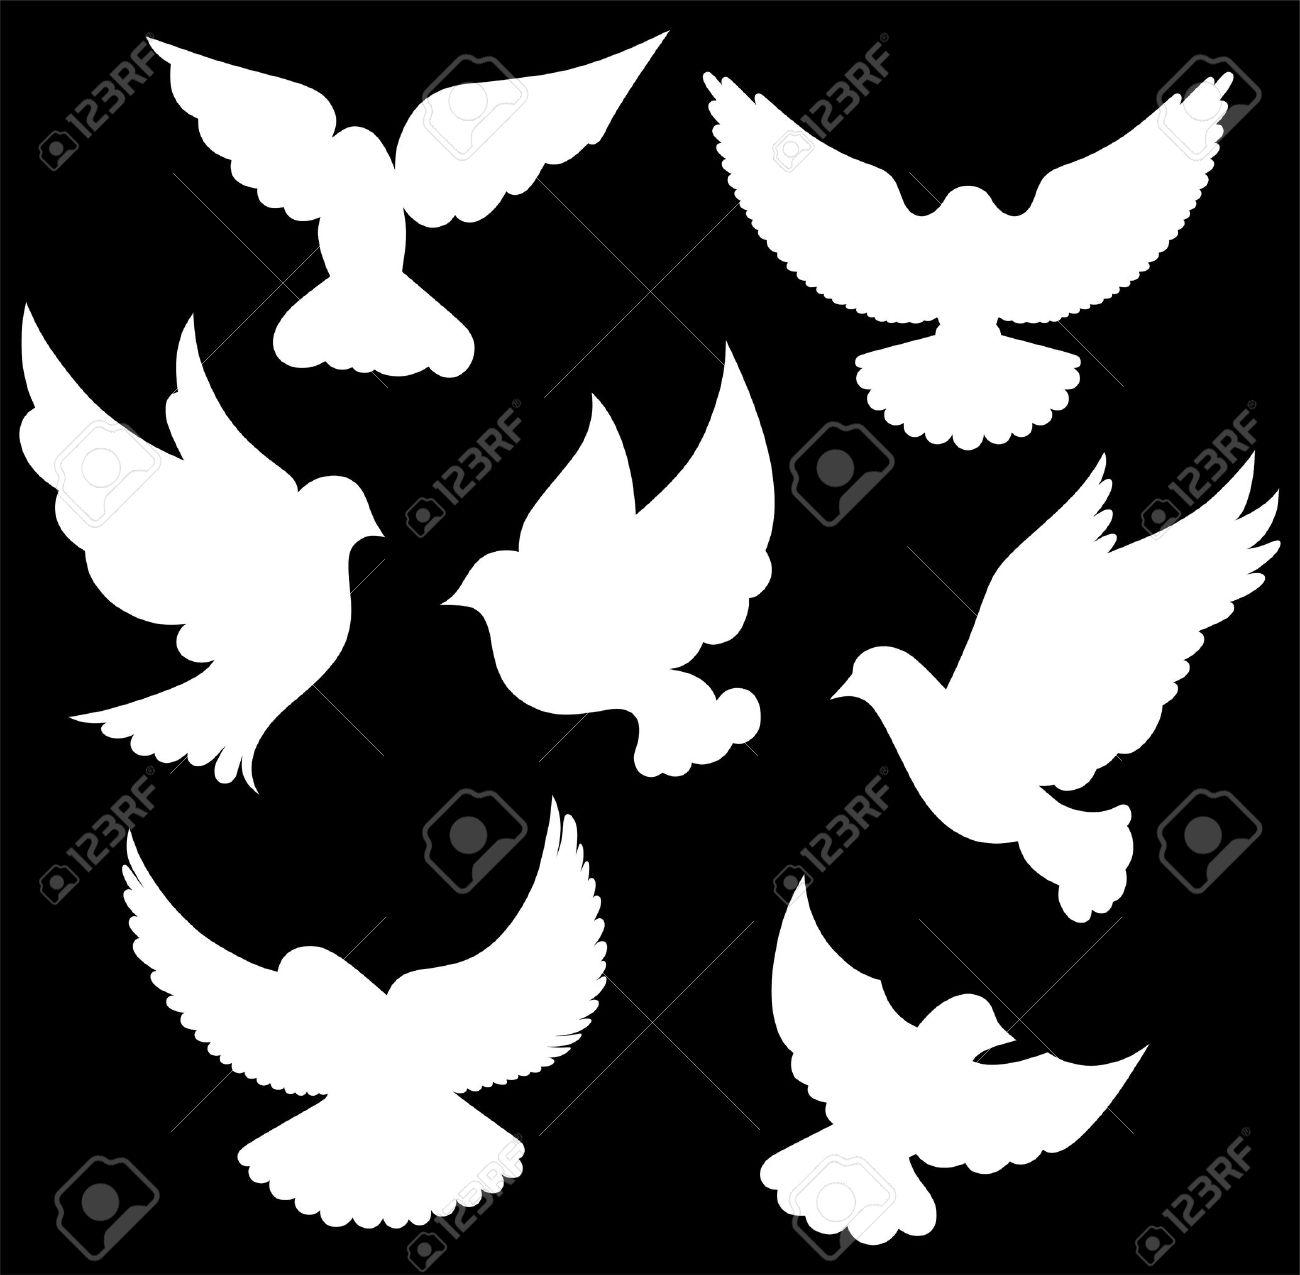 Dove symbol royalty free cliparts vectors and stock illustration dove symbol stock vector 15831665 biocorpaavc